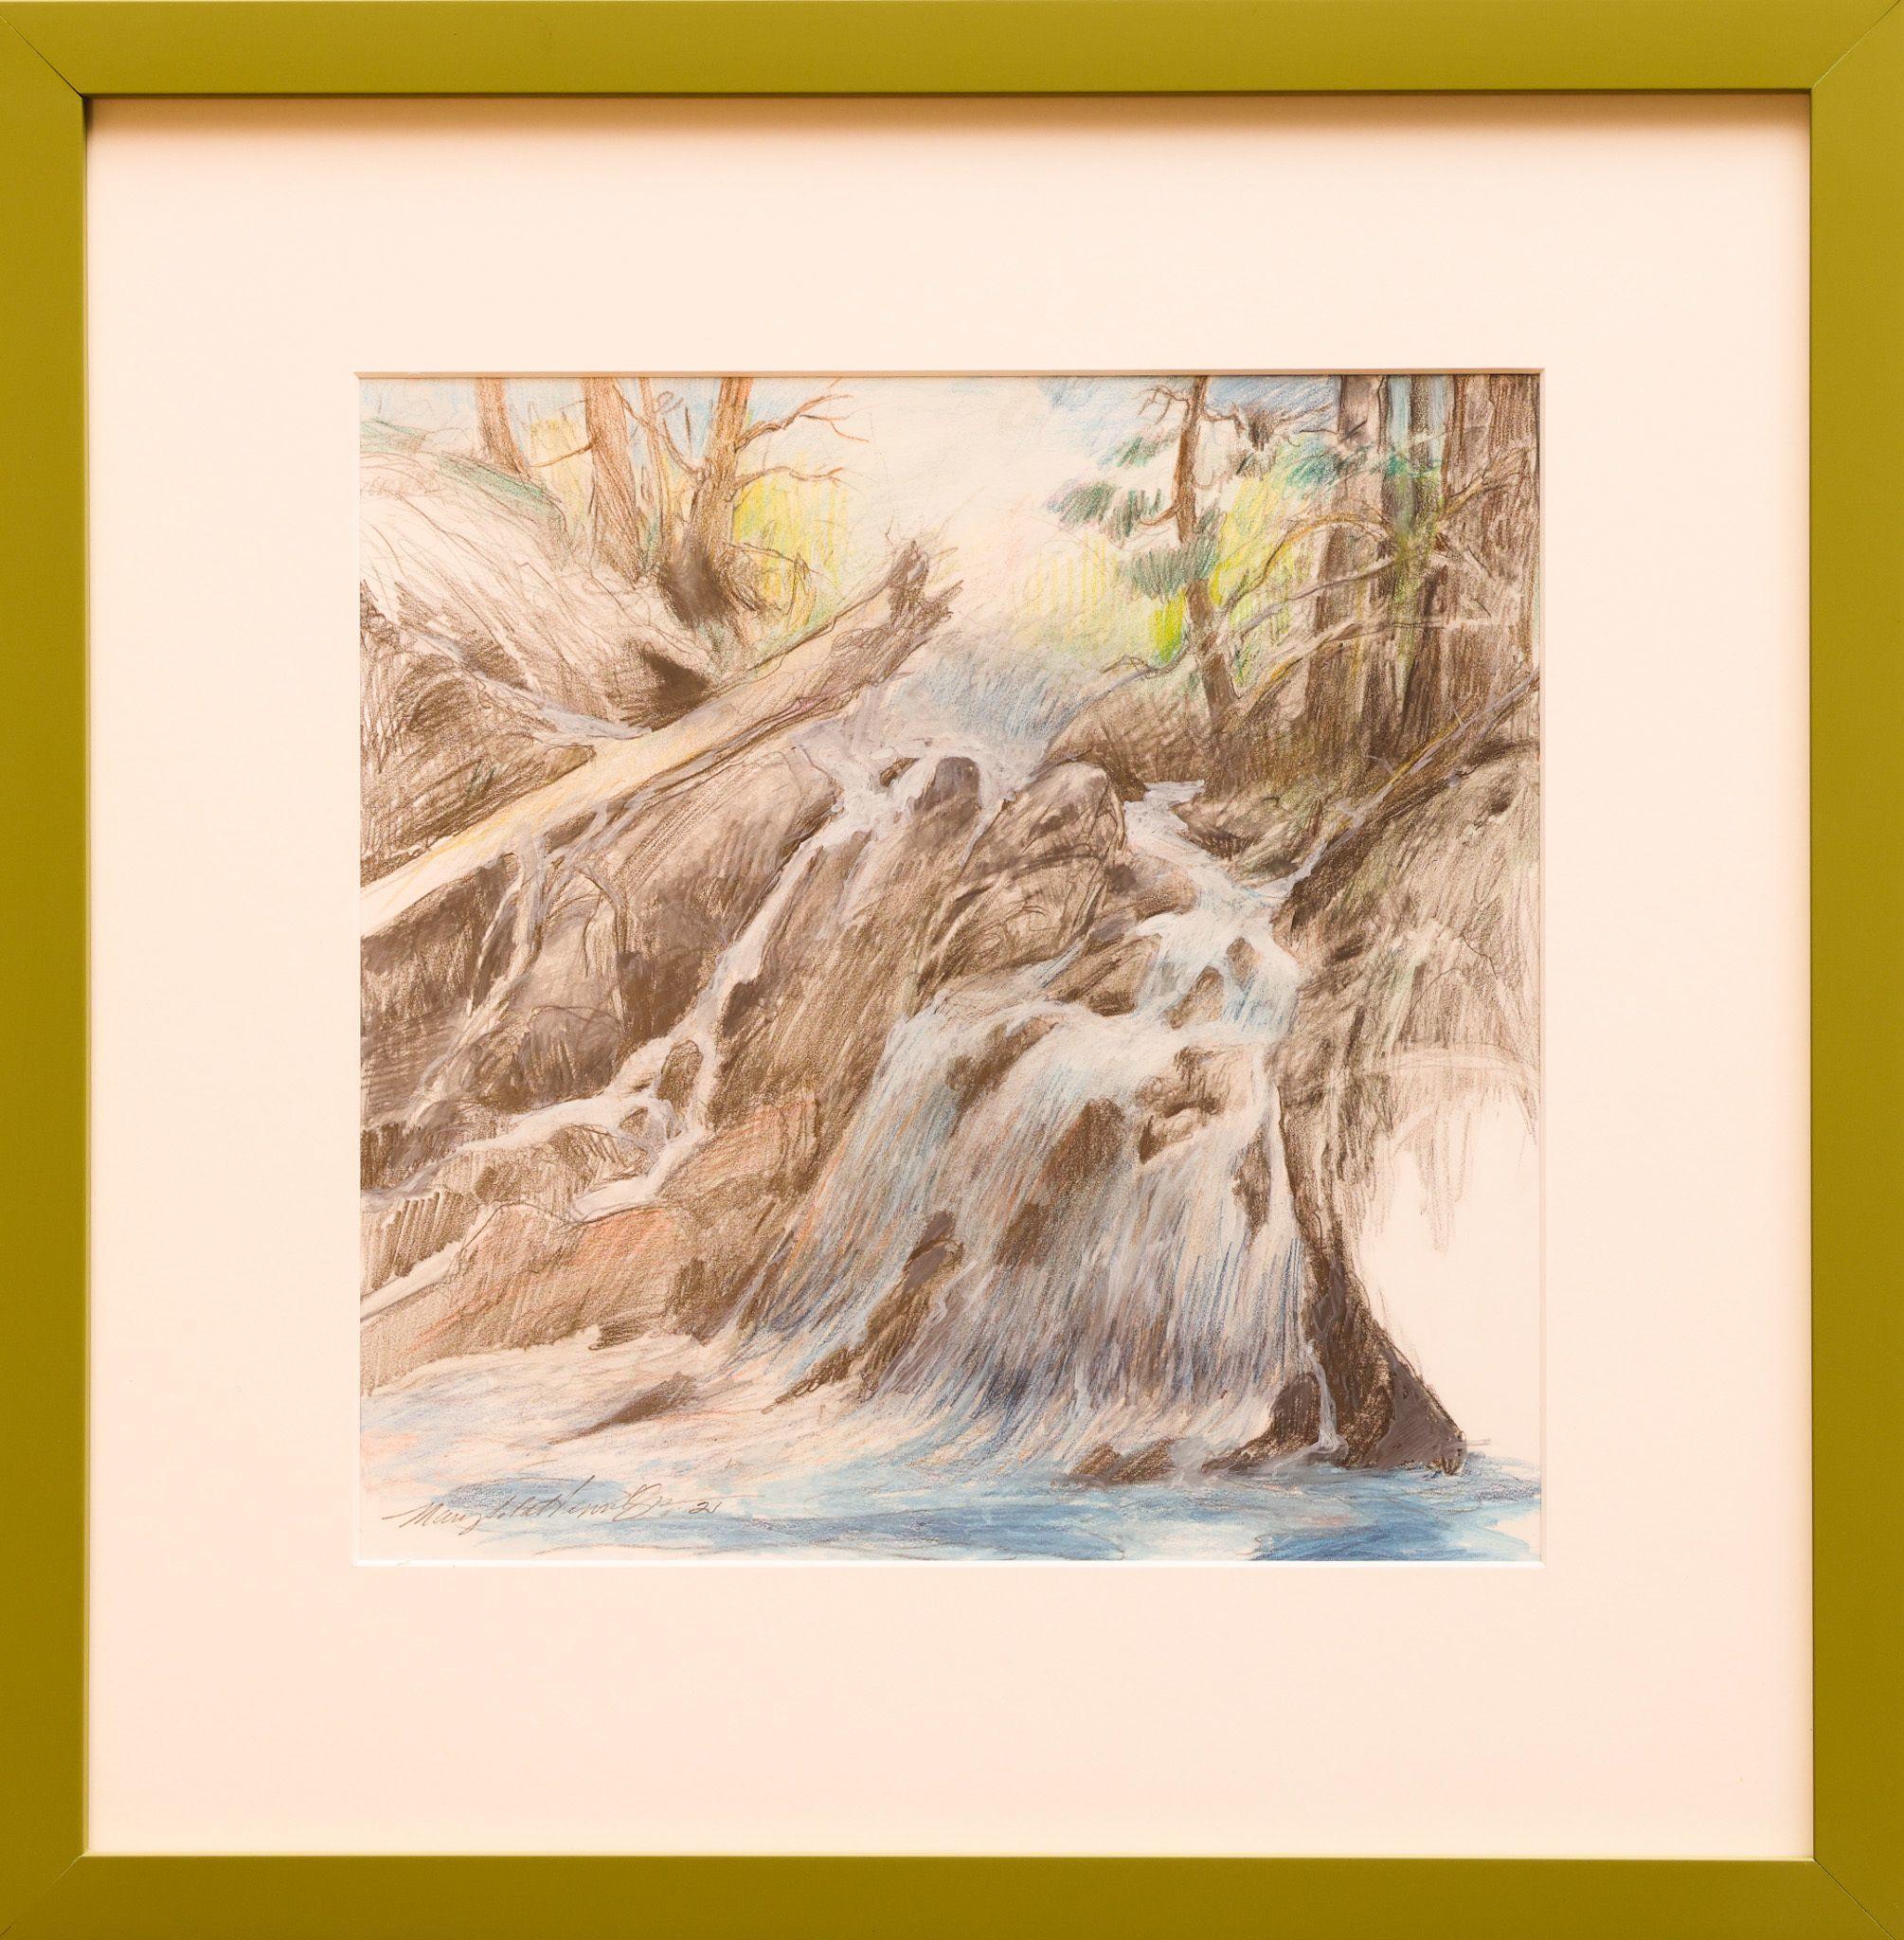 """Cleveland Peninsula Creek"" Mary Ida Henrikson"